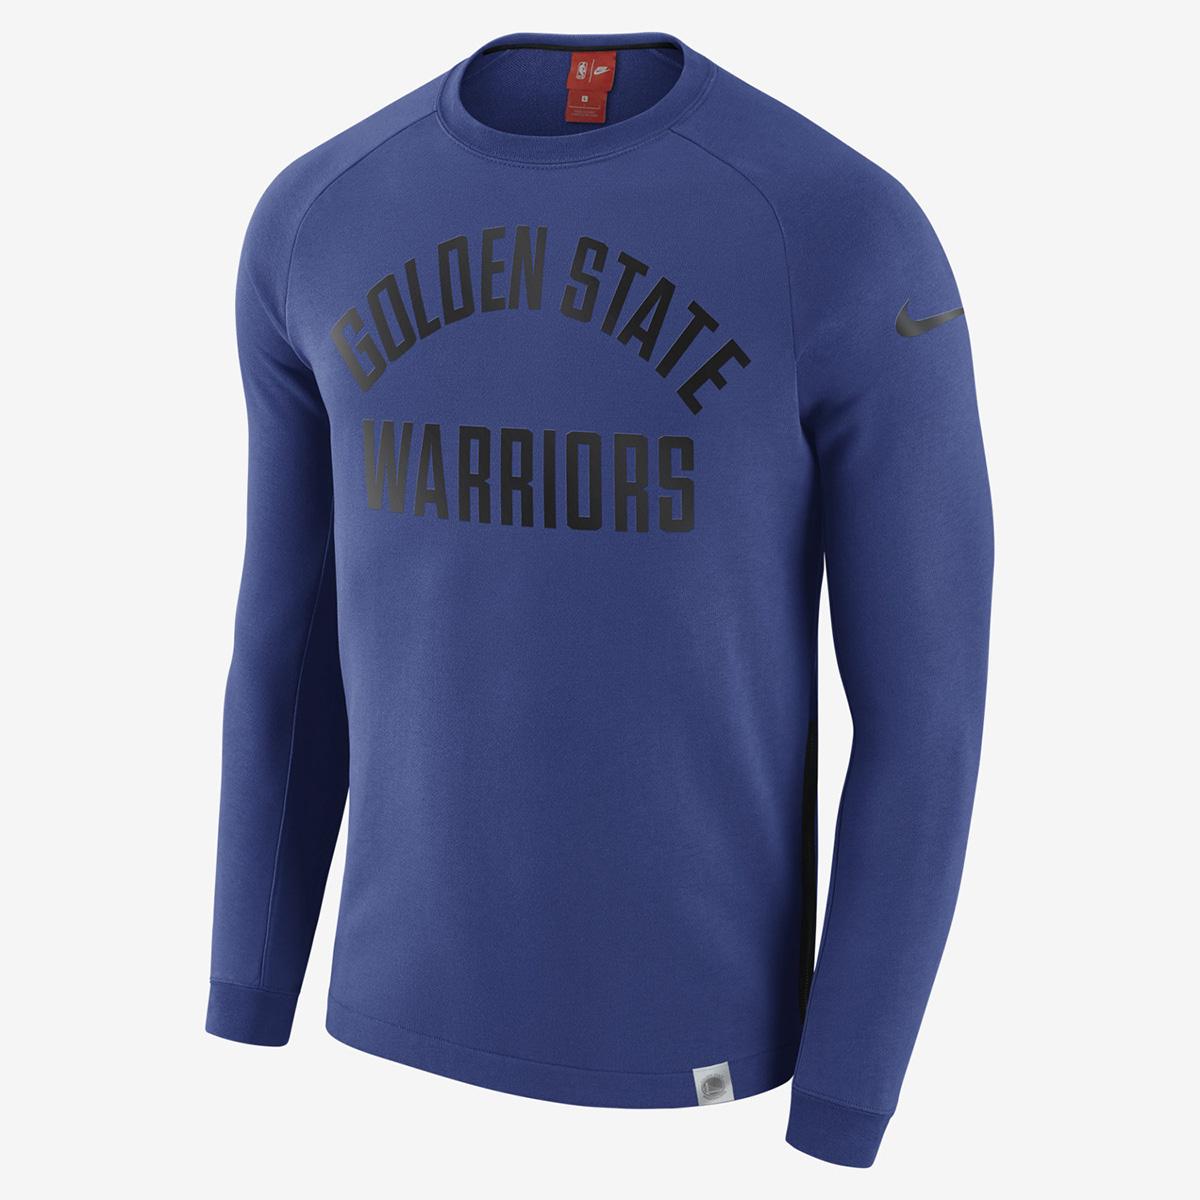 pretty nice 1b60e 43d1f Nike NBA Golden State Warriors Modern Long Sleeve Crewneck ...